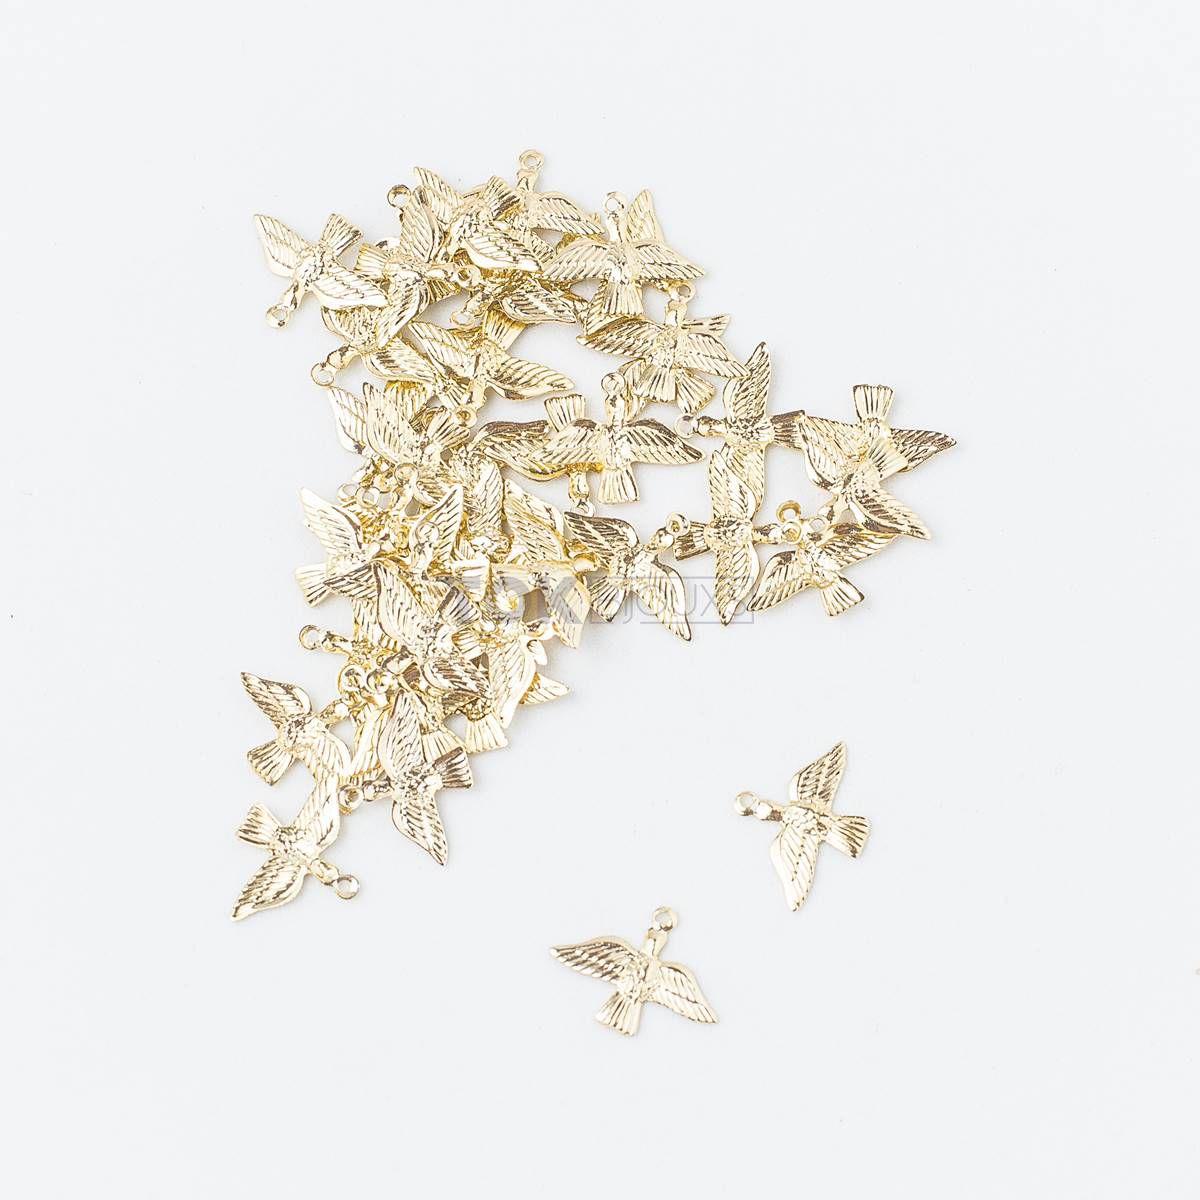 Pingente - Divino Espirito Santo - Dourado - 50 unid